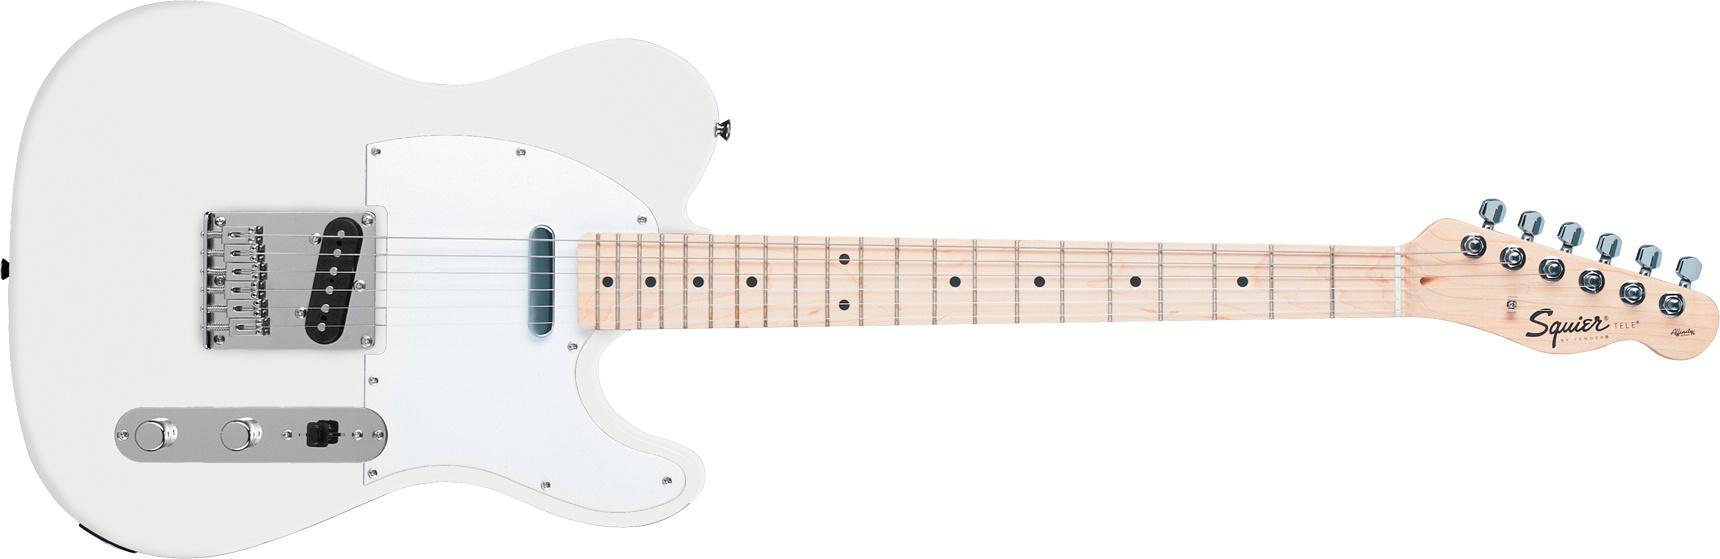 squier品牌_电吉他_affinity series_0310202580 产品